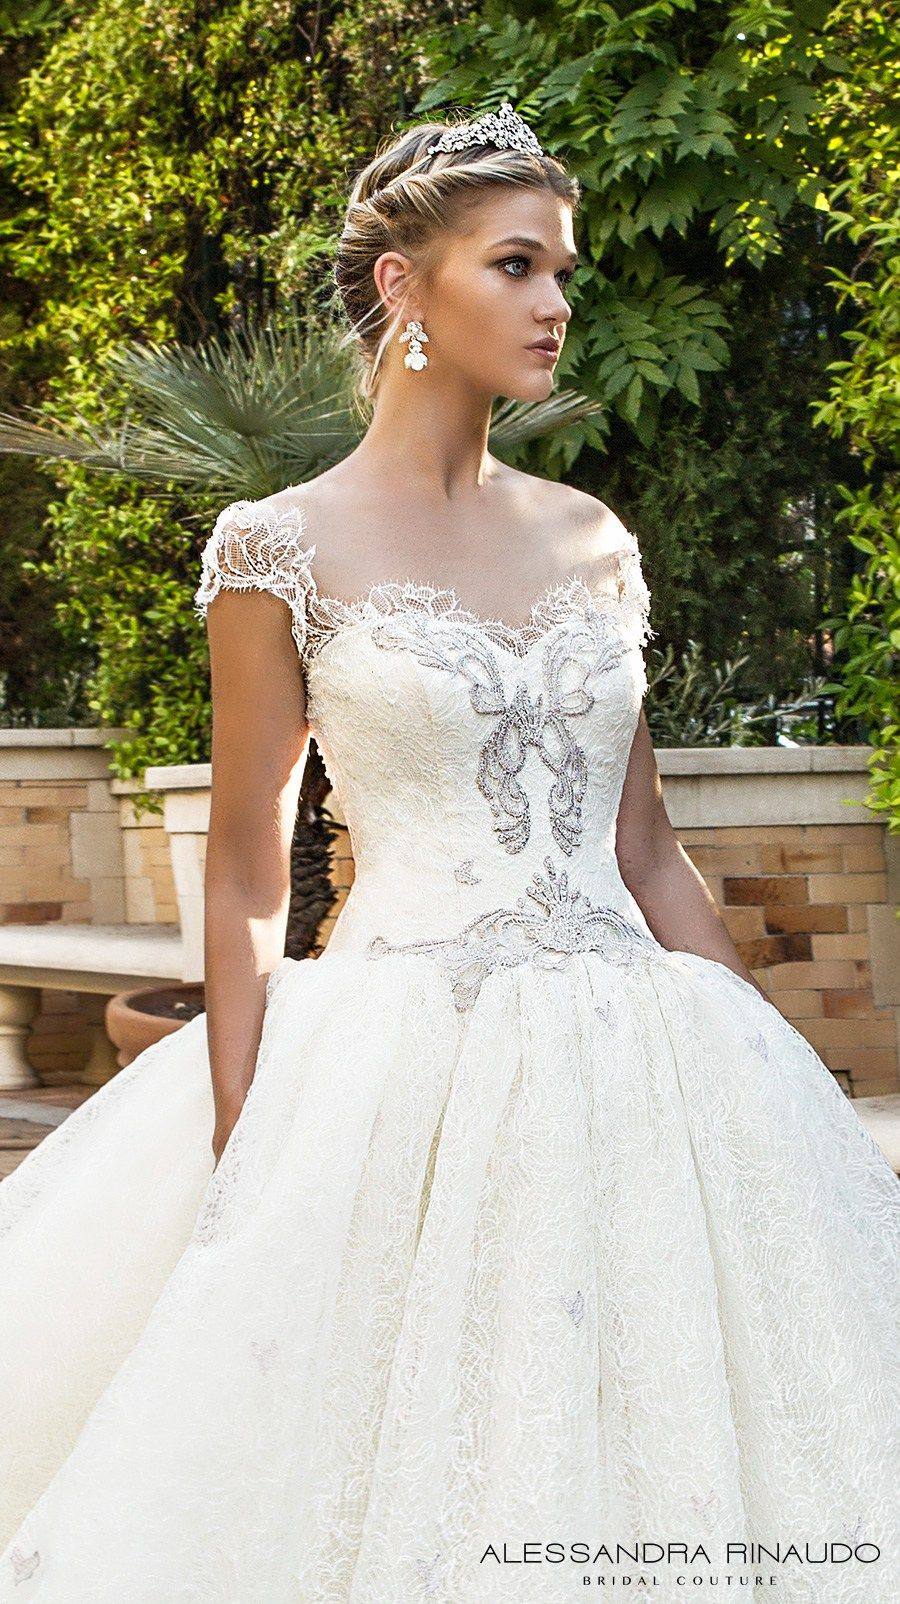 Mini wedding dresses  Alessandra Rinaudo  Wedding Dresses bridalgown  Bridal Fashion